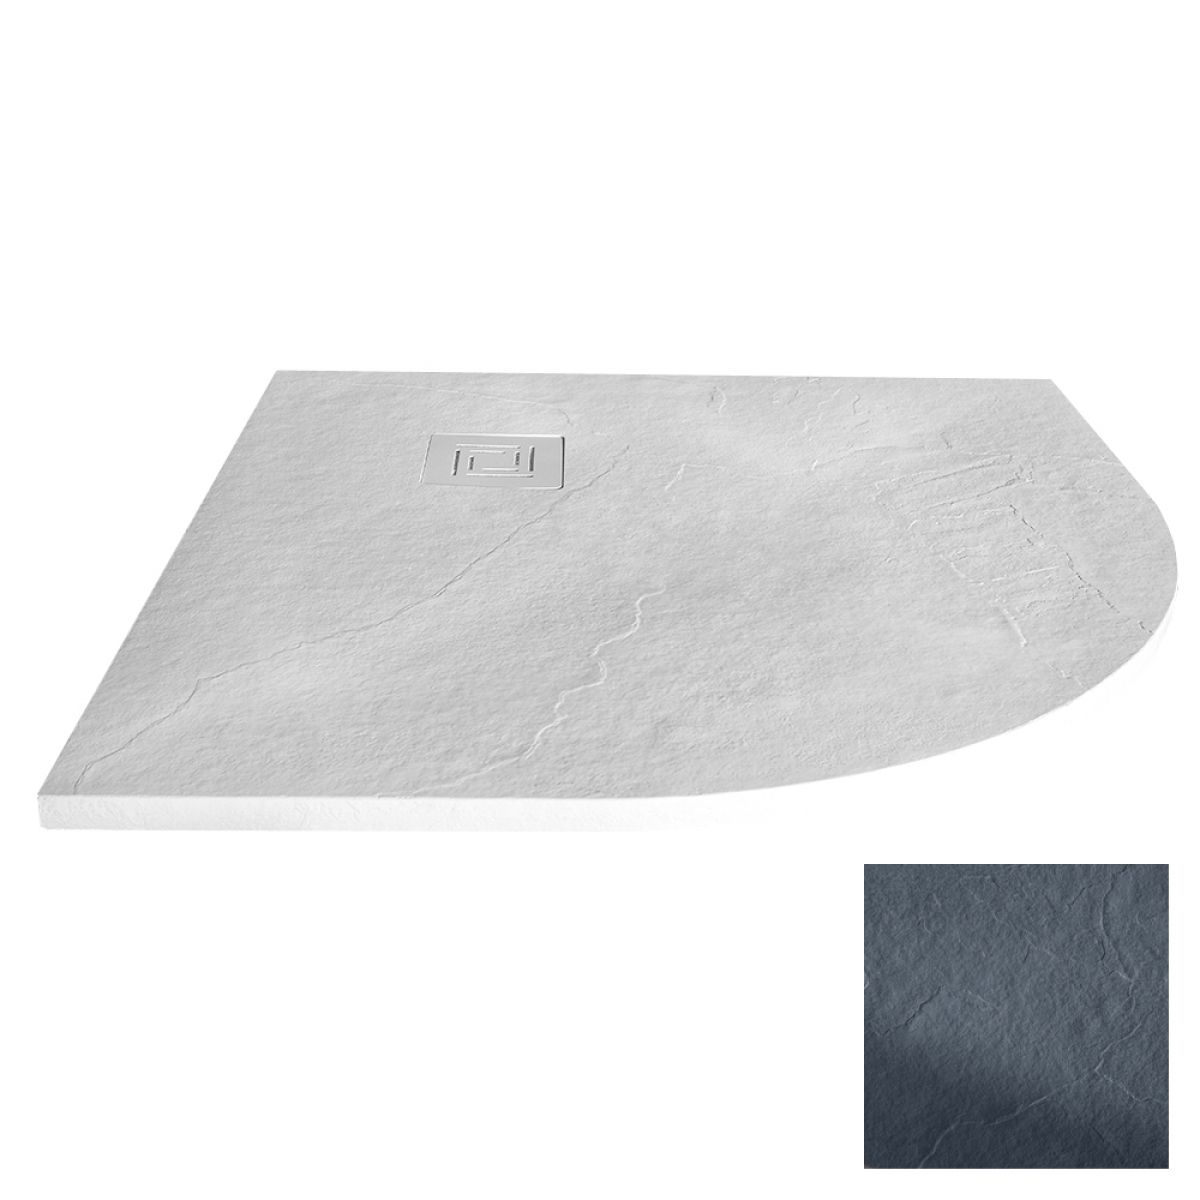 Merlyn Truestone Slate Black Quadrant Shower Tray 900 x 900mm